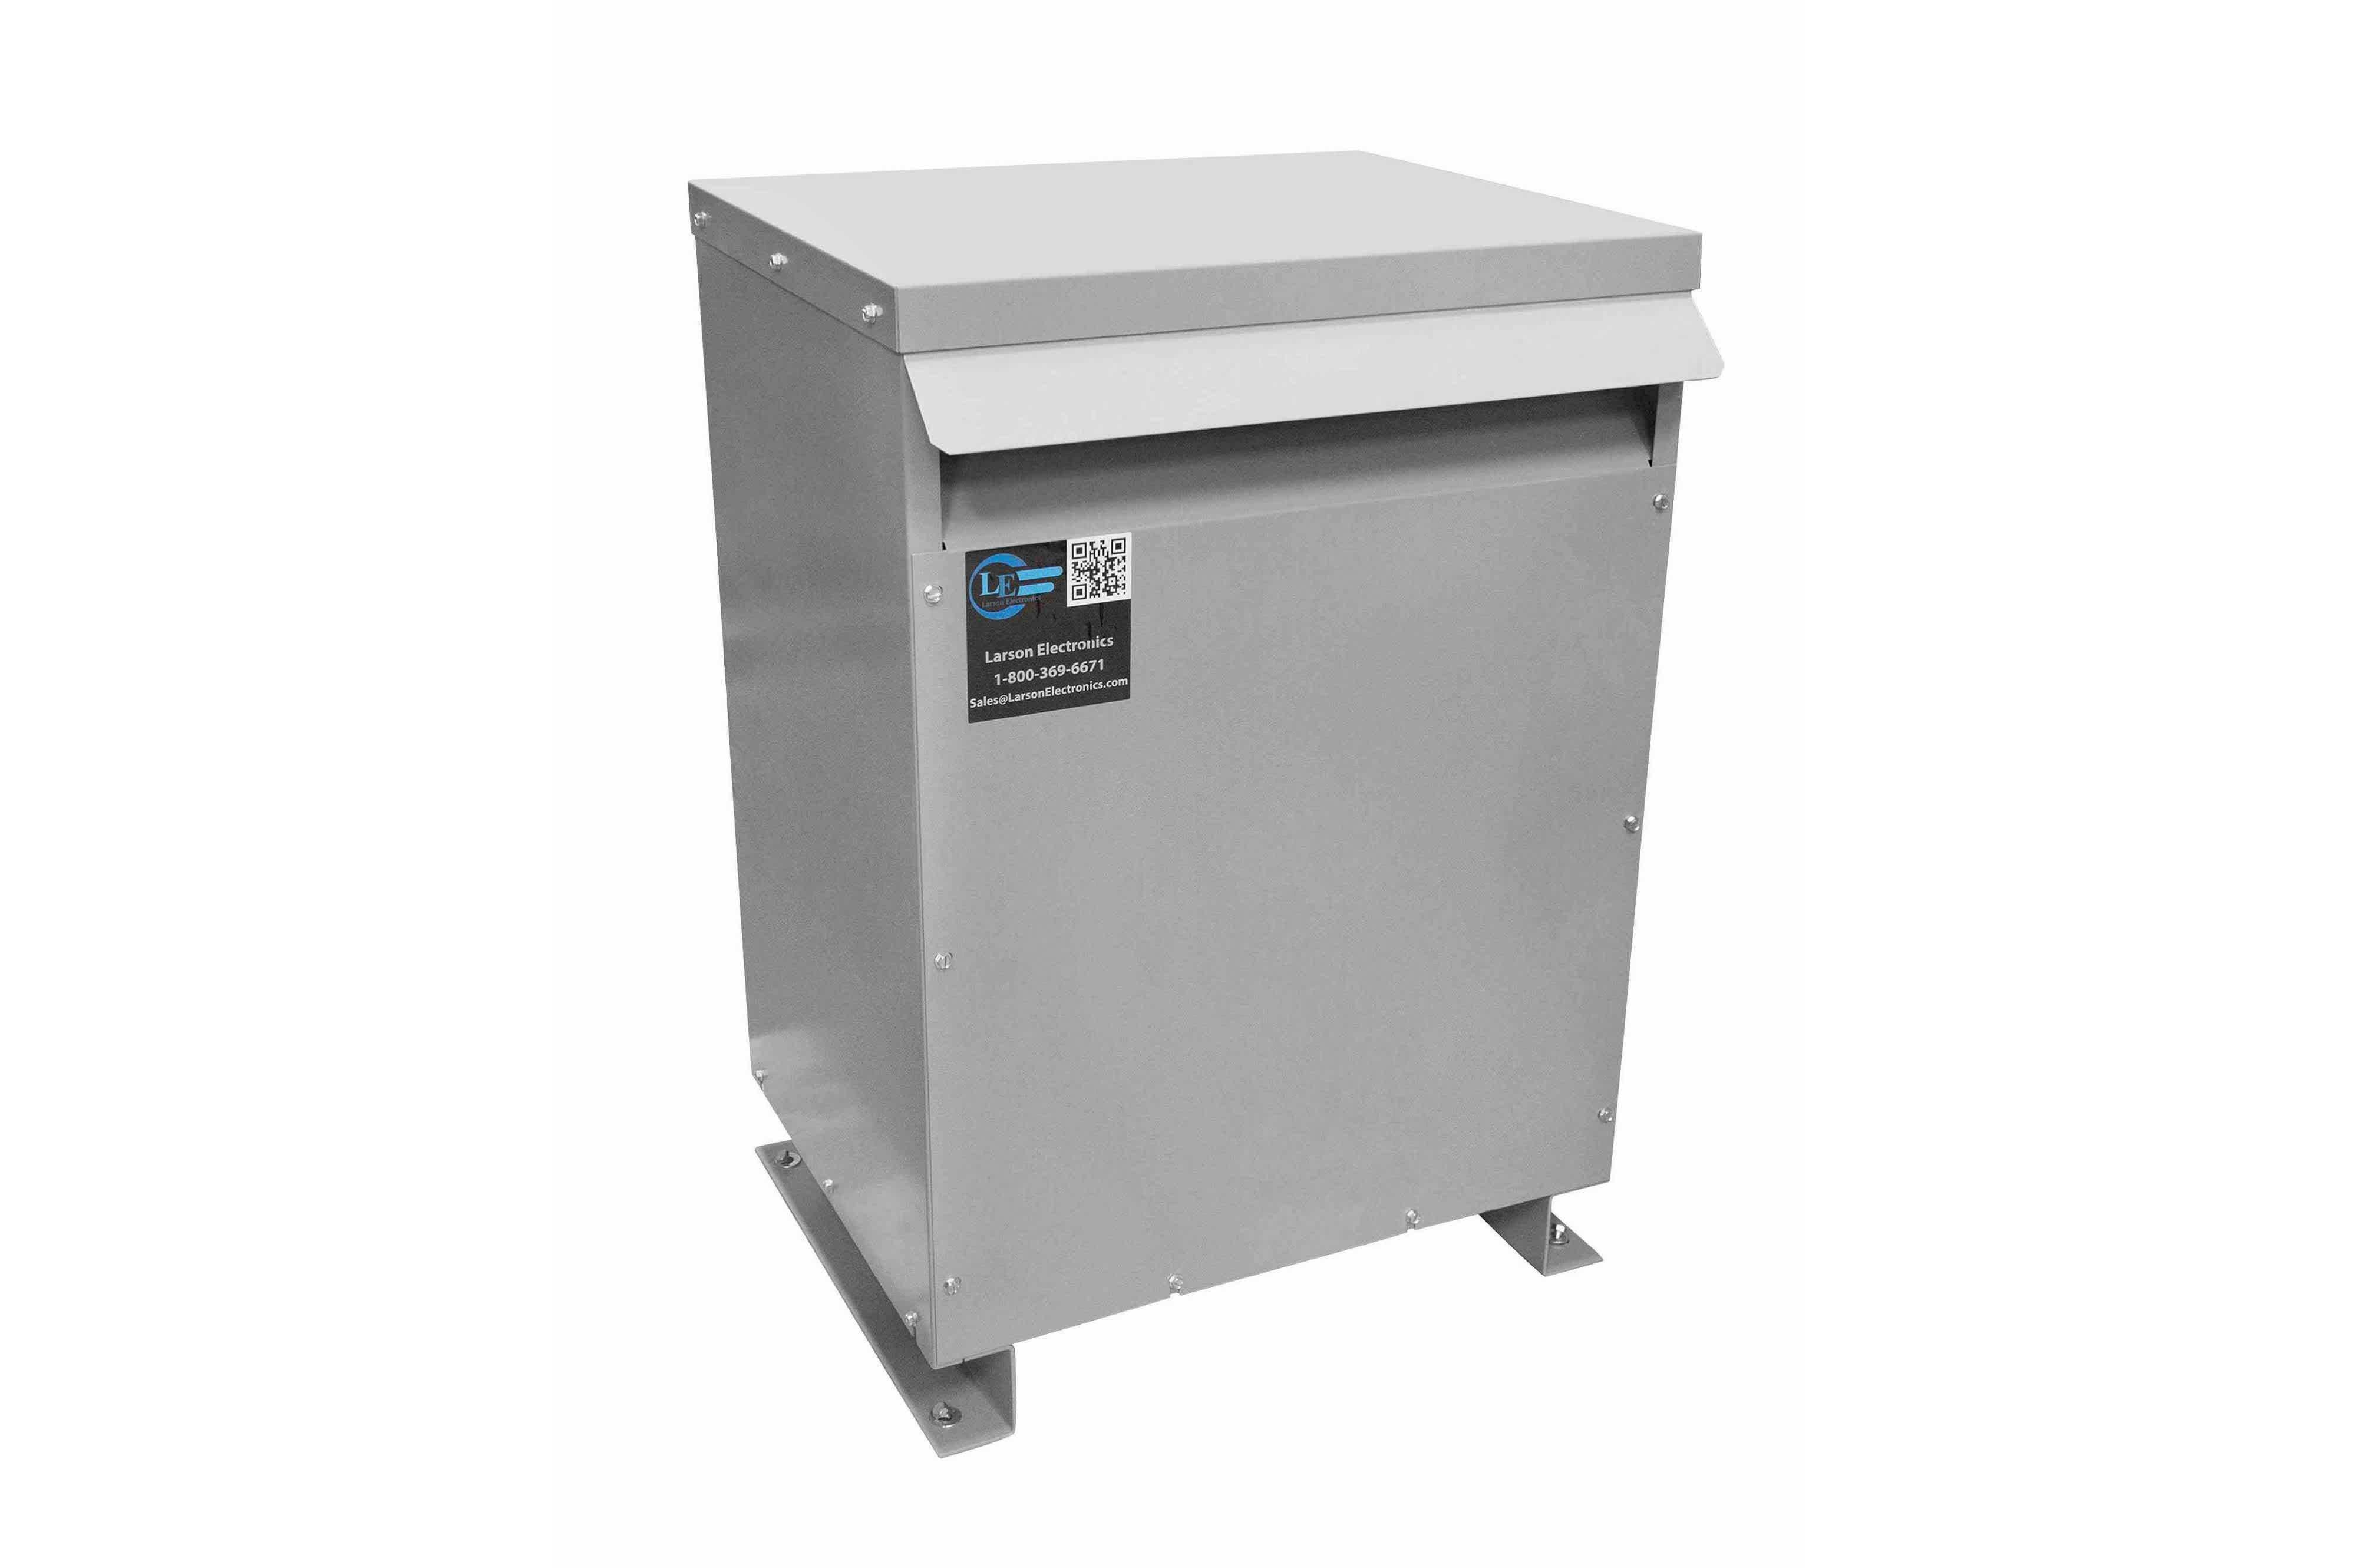 500 kVA 3PH Isolation Transformer, 240V Wye Primary, 208V Delta Secondary, N3R, Ventilated, 60 Hz